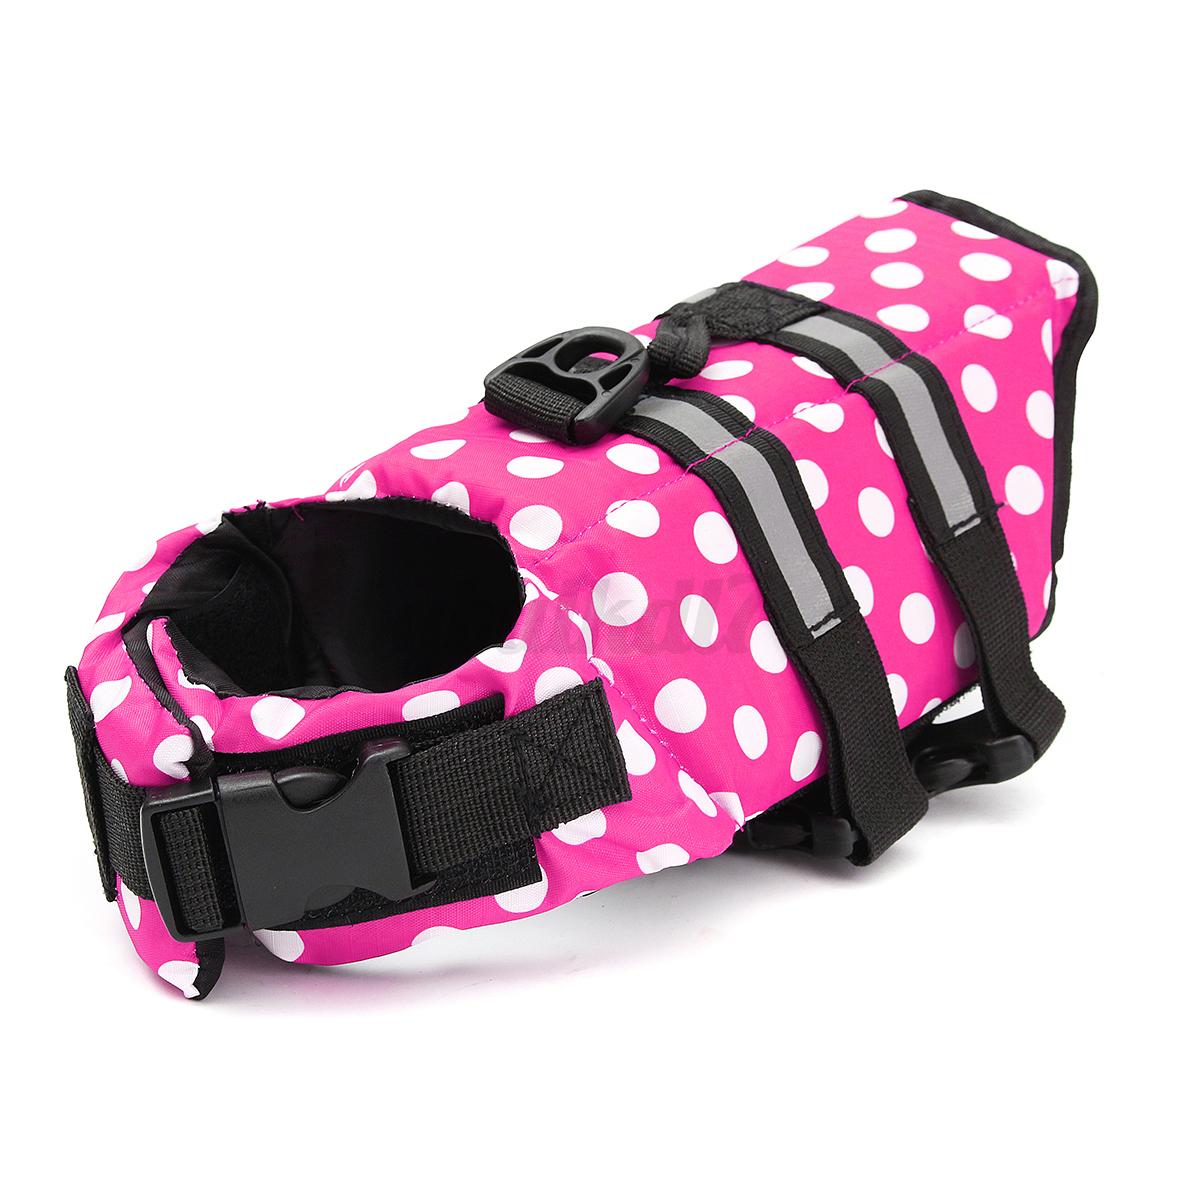 Dog-Life-Jacket-Safty-Pet-Floating-Vest-Swimming-Preserver-Float-Saver-Coat-XXL